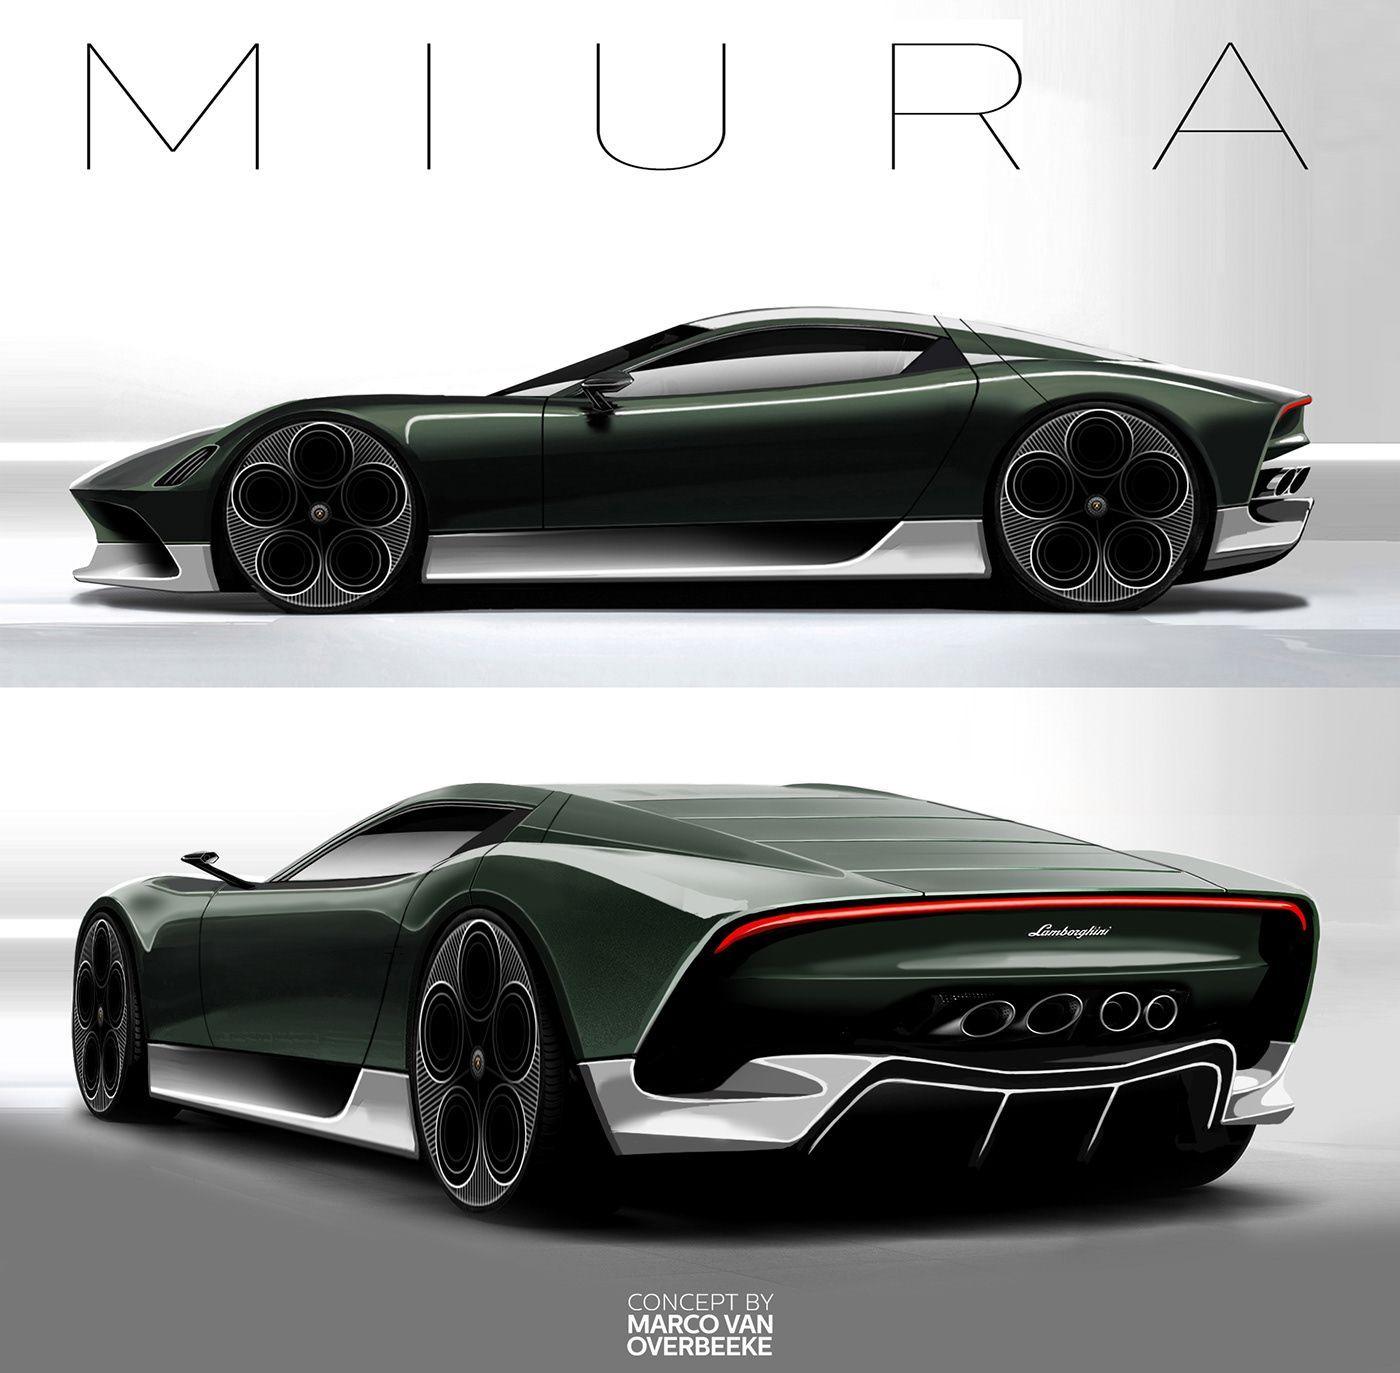 Lamborghini Miura Nuova Concept Ii On Behance In 2020 Lamborghini Concept Concept Car Design Concept Cars Vintage